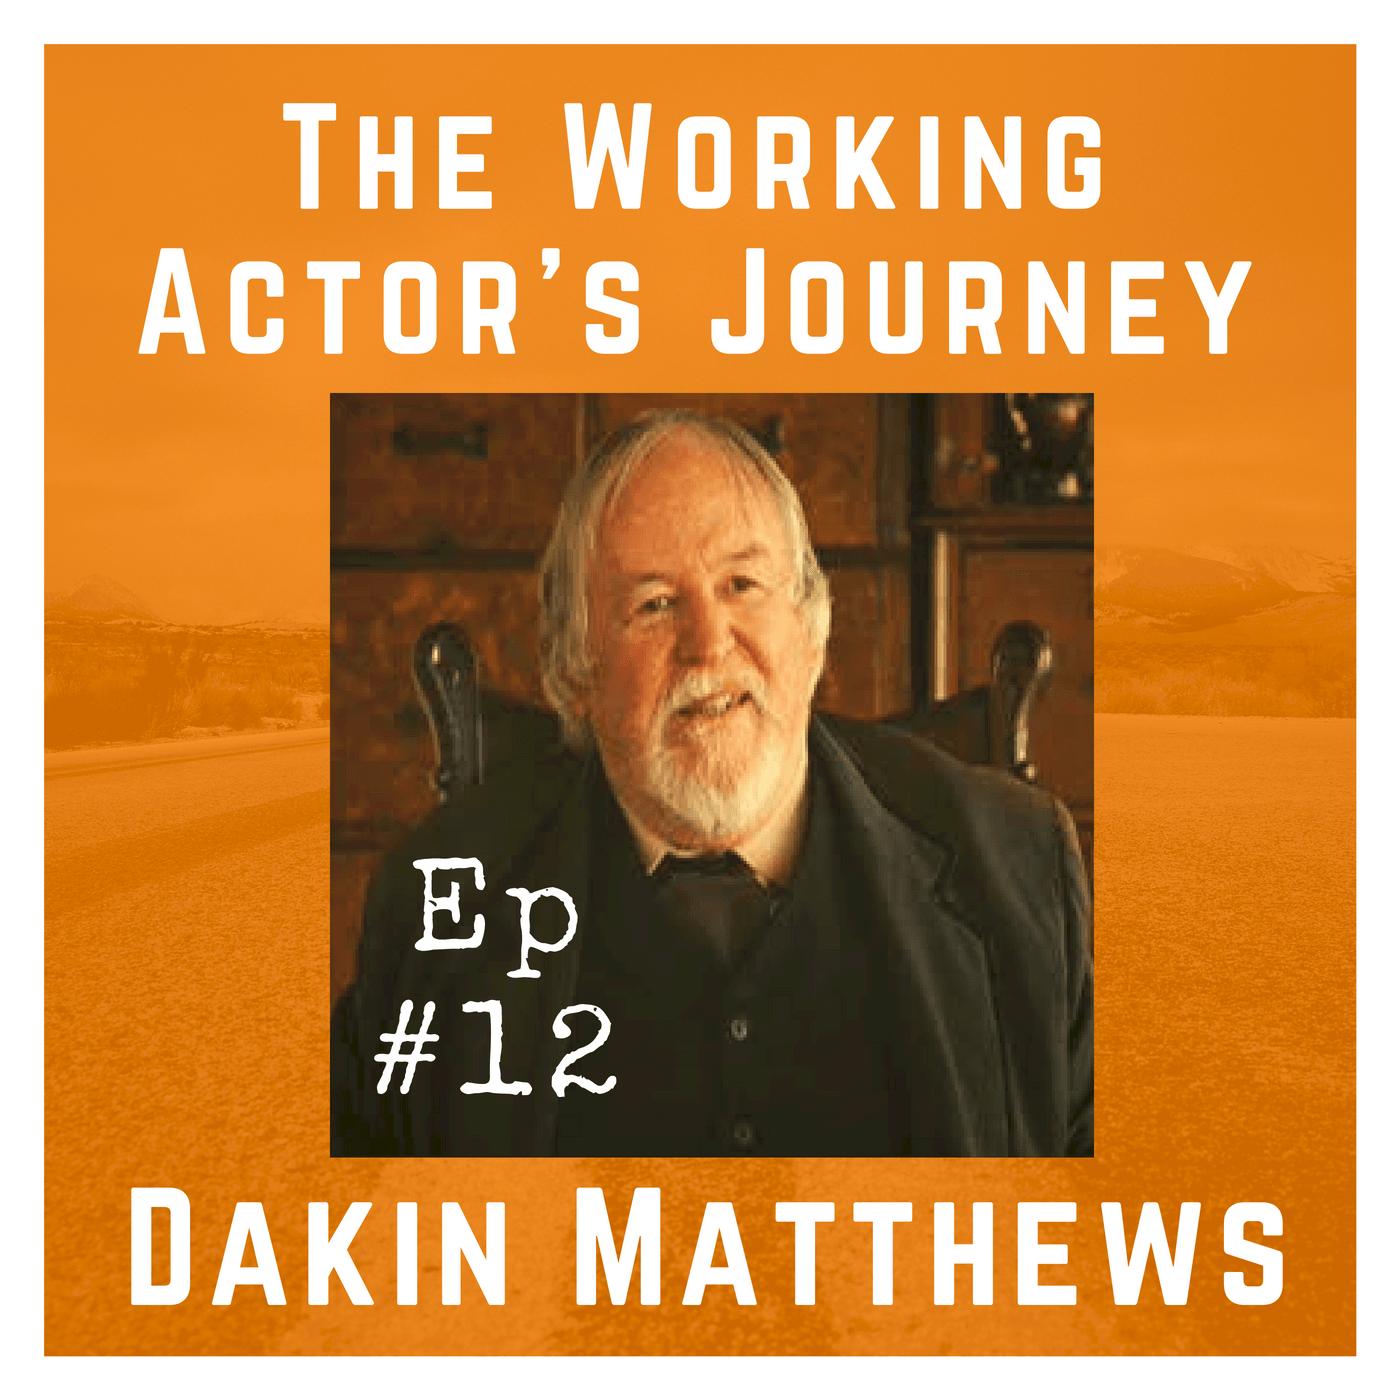 Ep 12 with Dakin Matthews